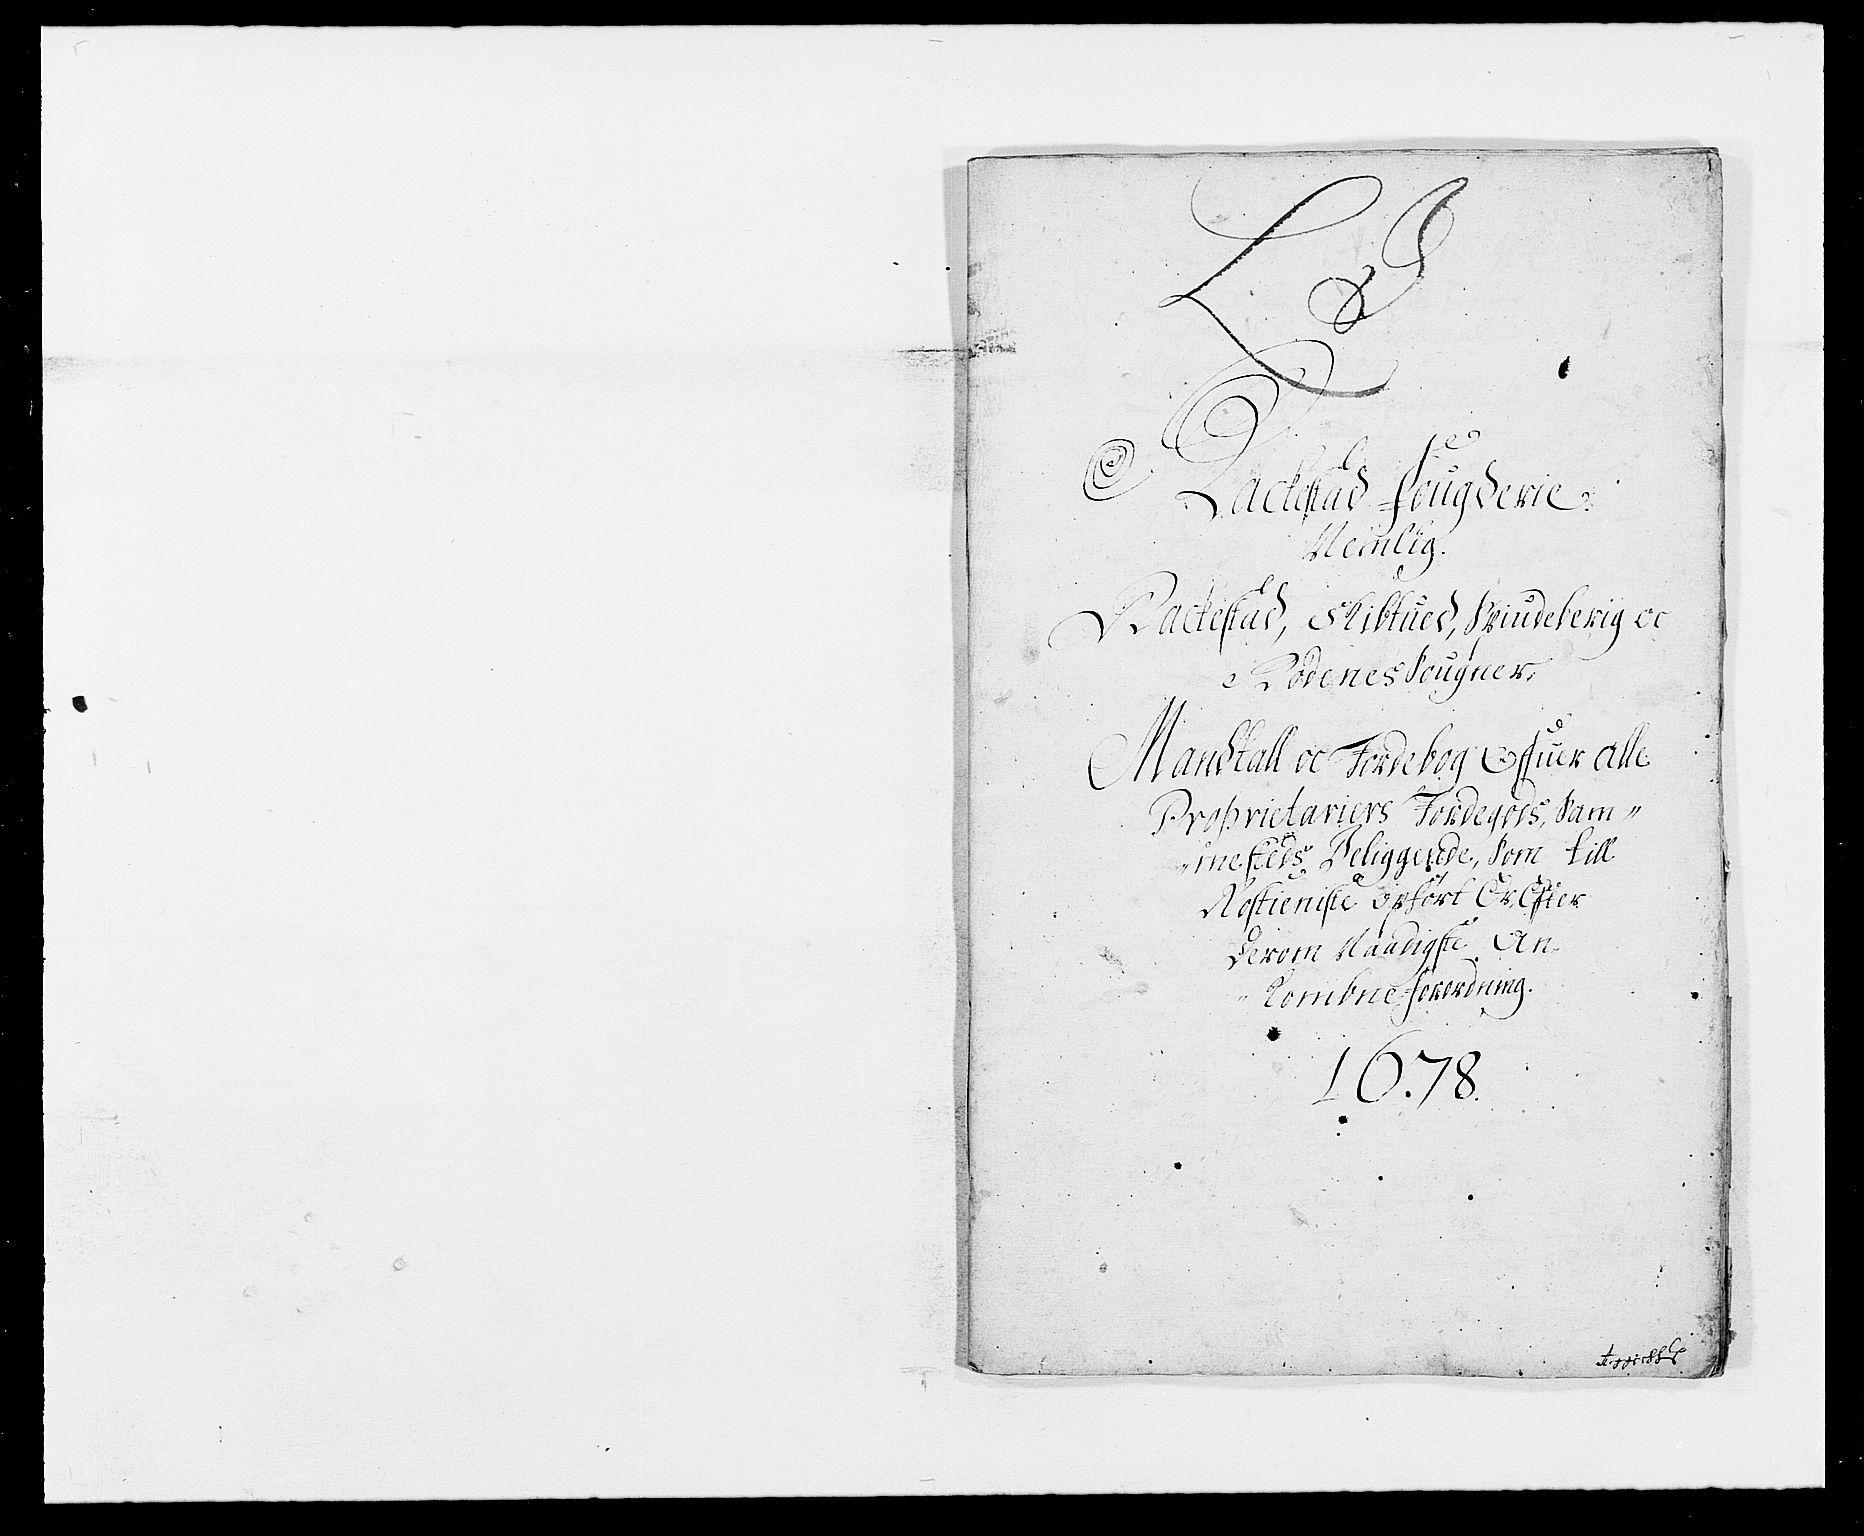 RA, Rentekammeret inntil 1814, Reviderte regnskaper, Fogderegnskap, R05/L0271: Fogderegnskap Rakkestad, 1678-1679, s. 210